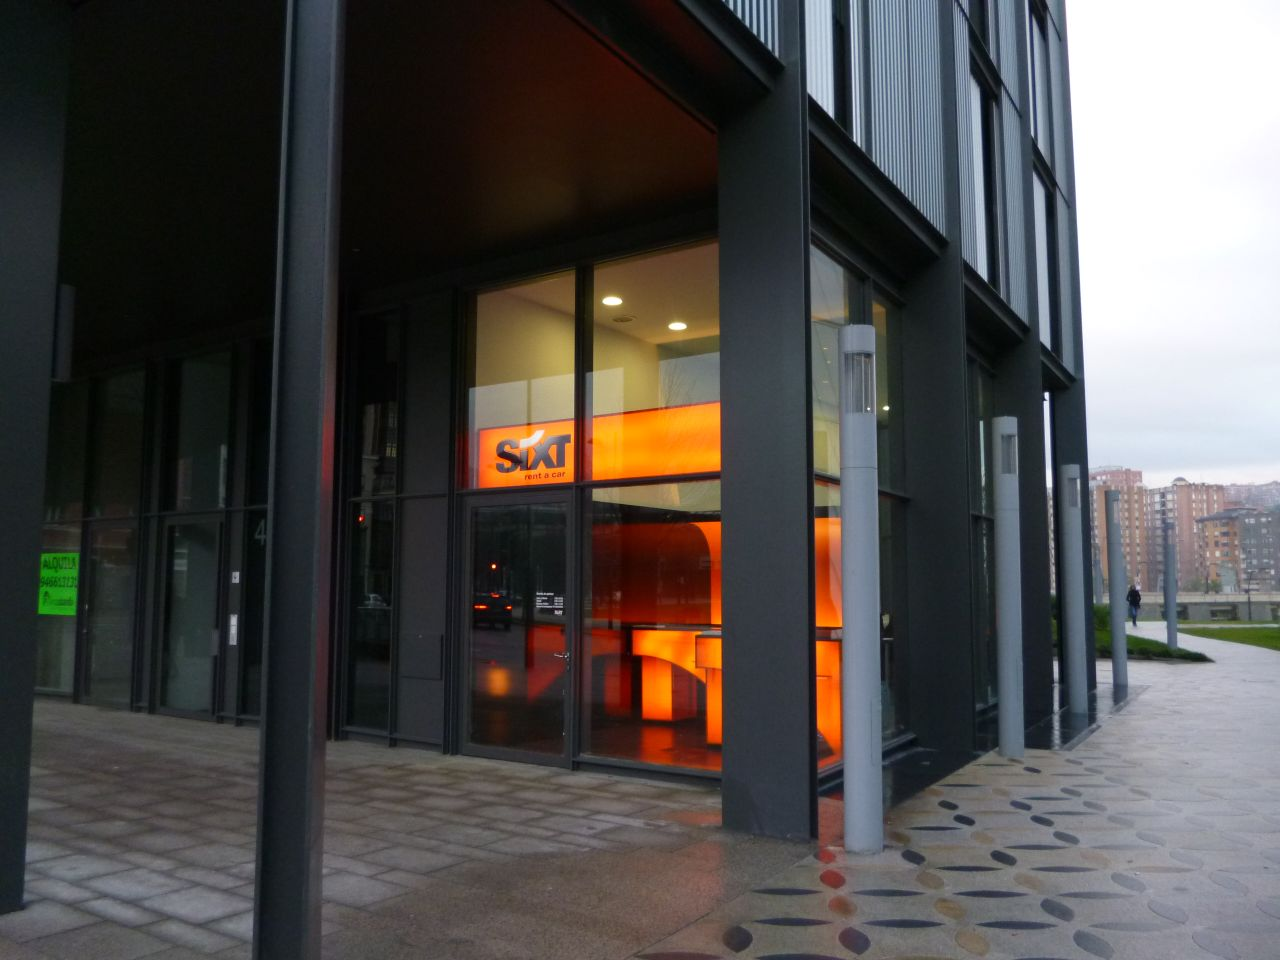 Revista coche sixt inaugura oficinas en bilbao - Oficinas en bilbao ...